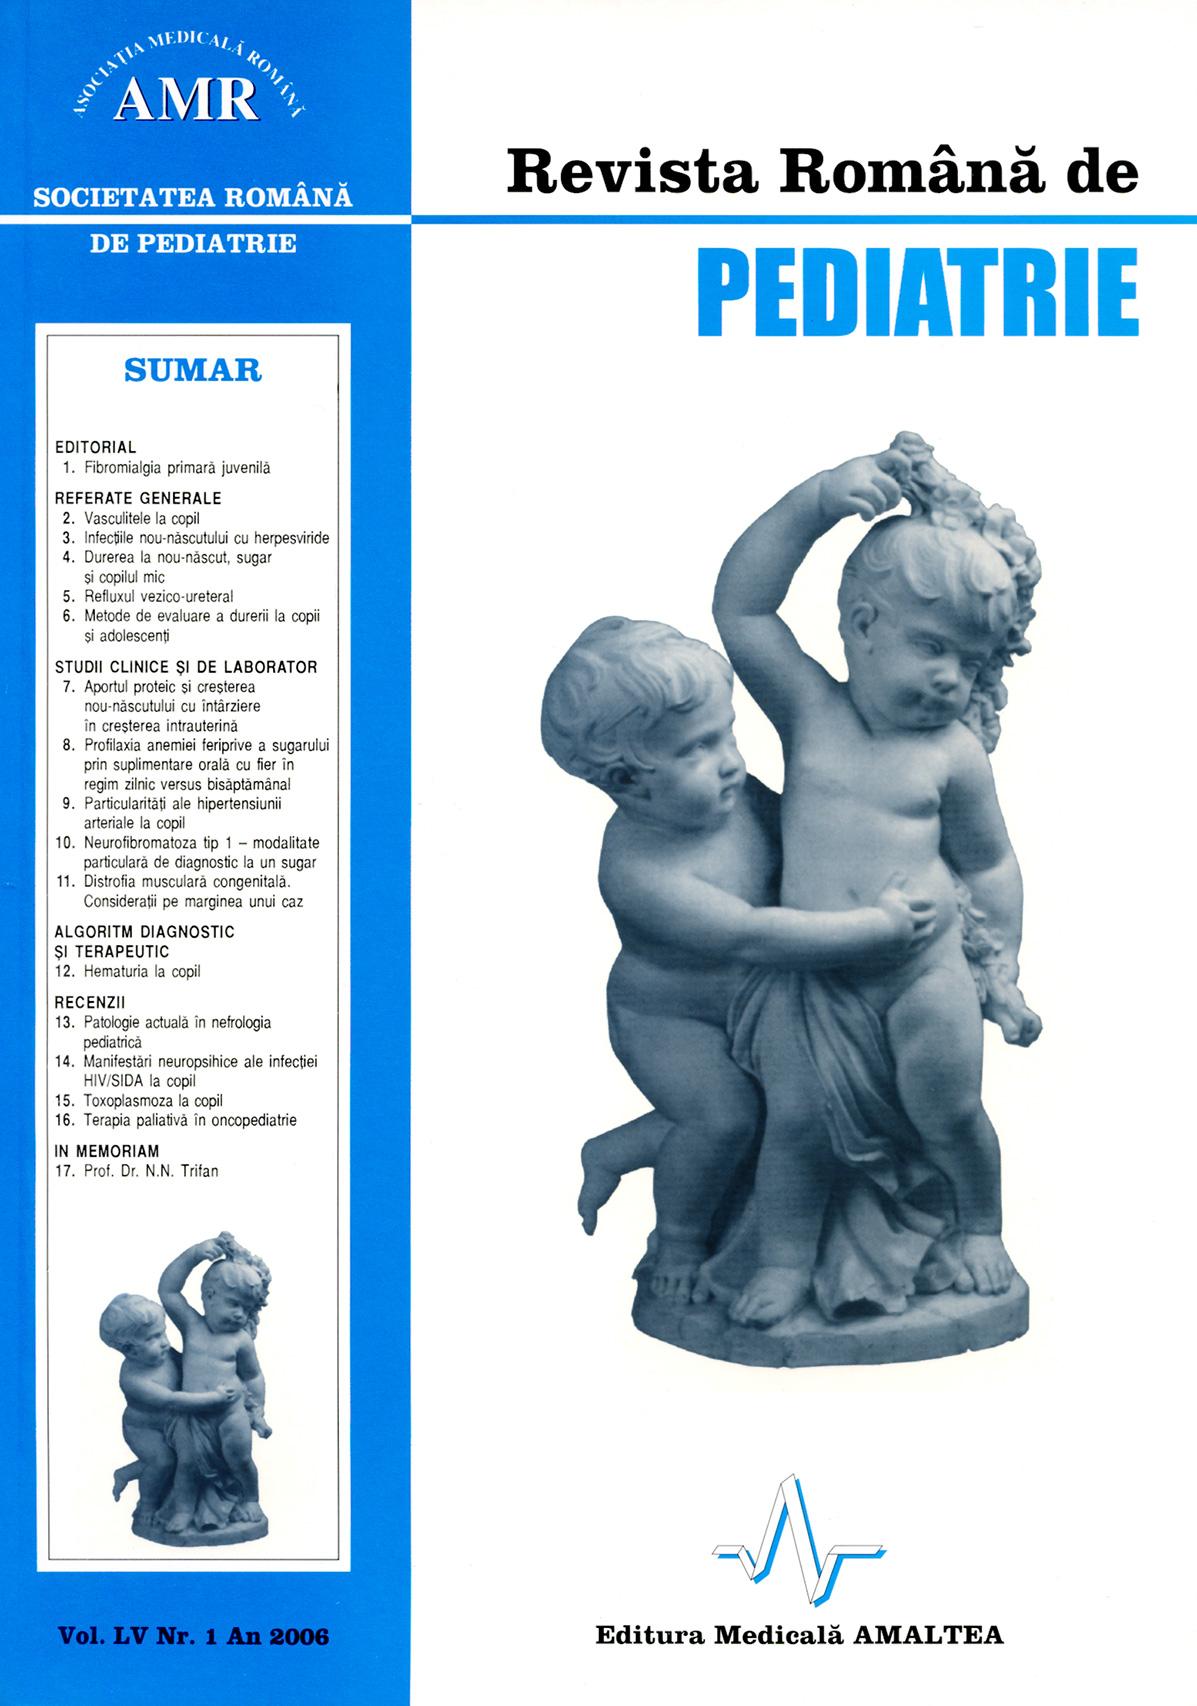 Revista Romana de PEDIATRIE | Volumul LV, Nr. 1, An 2006